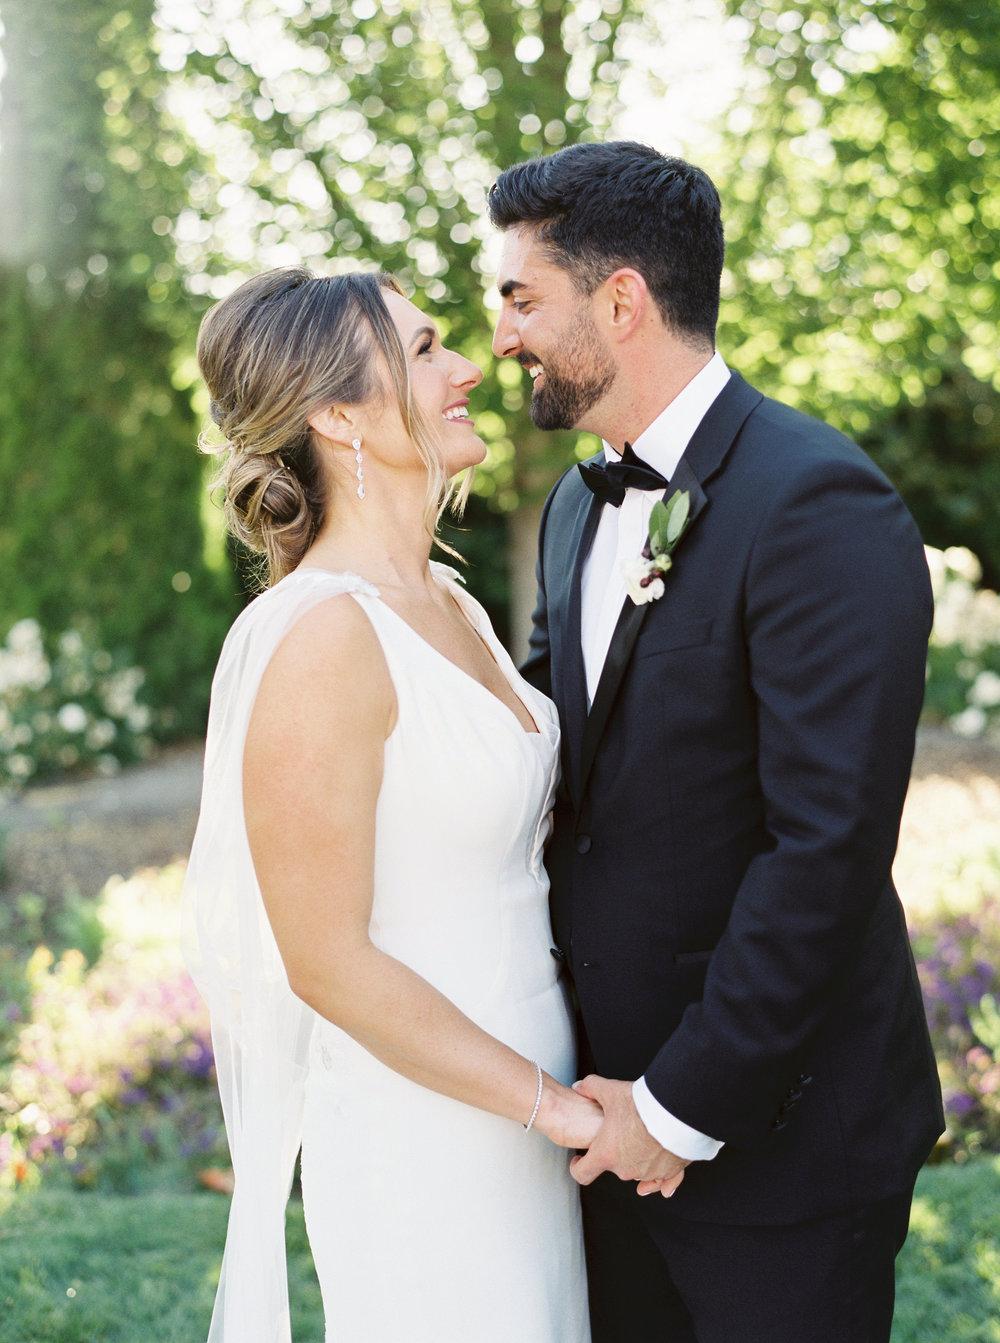 vintners-inn-wedding-in-santa-rosa-california-183.jpg